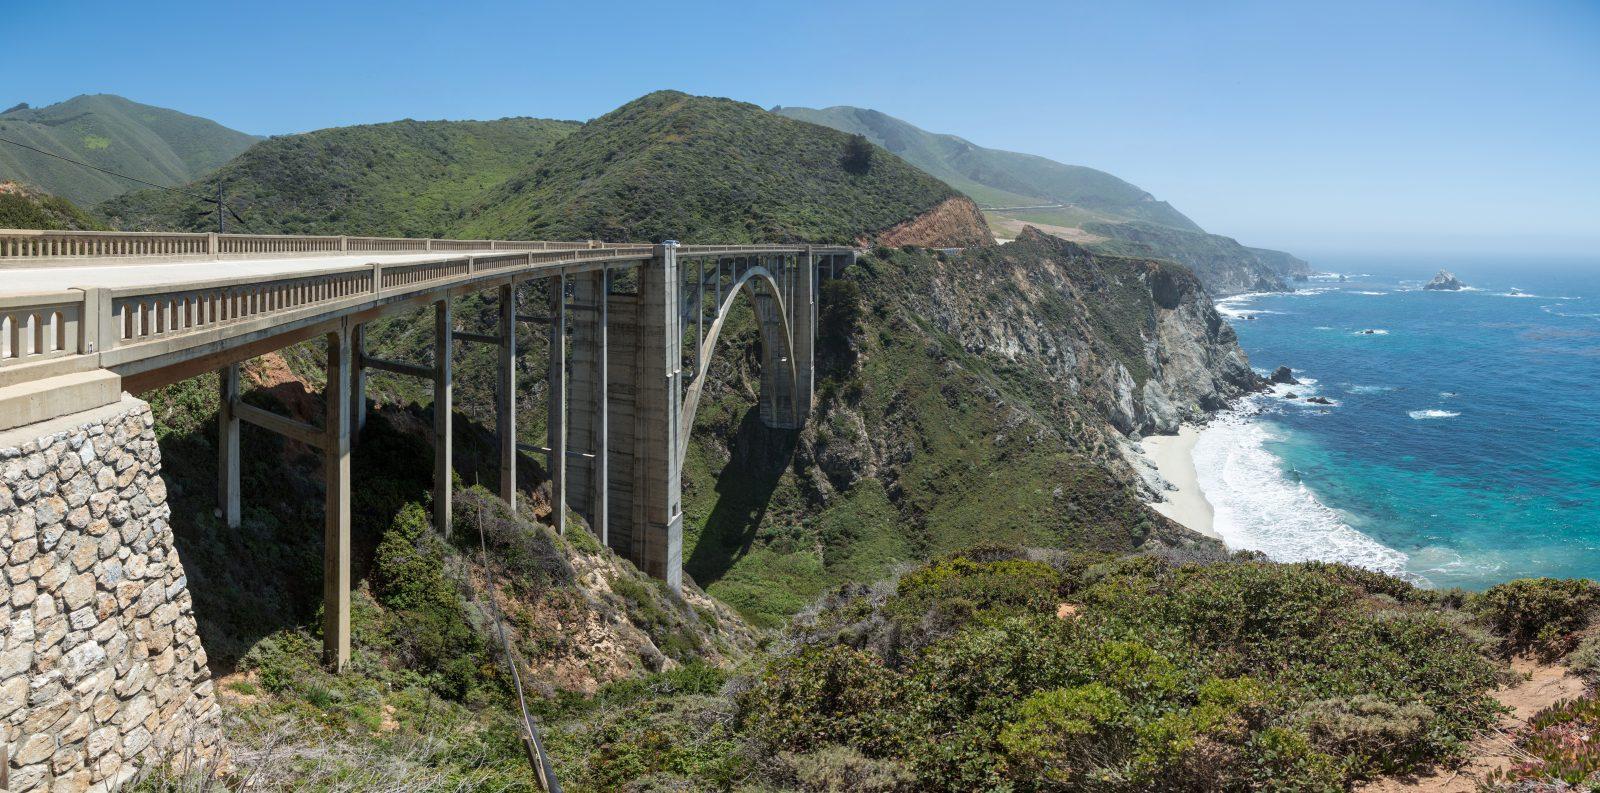 5. Pacific Coast Highway